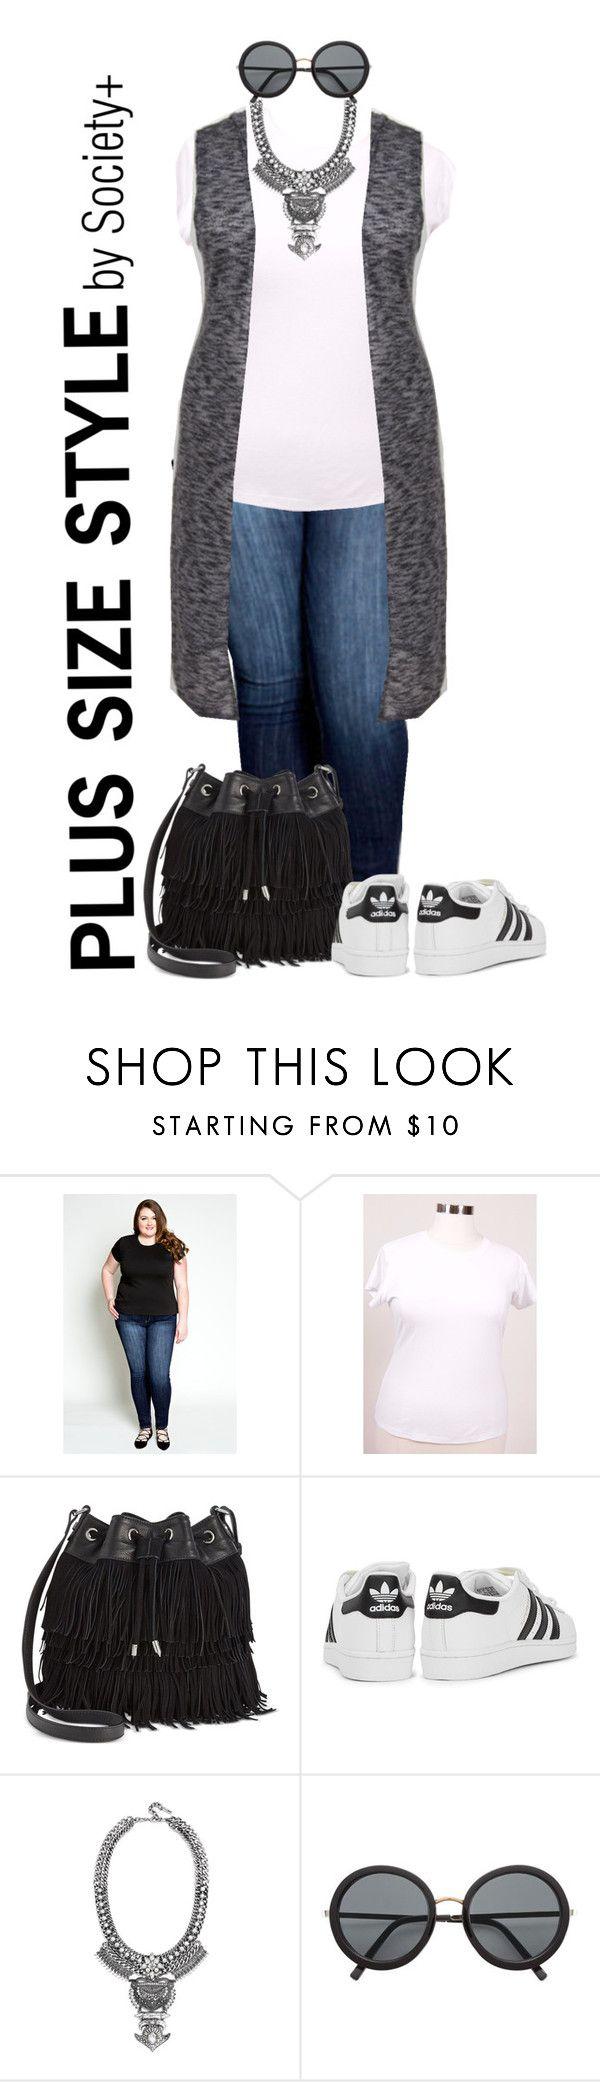 2952 best Plus Size Fashion images on Pinterest